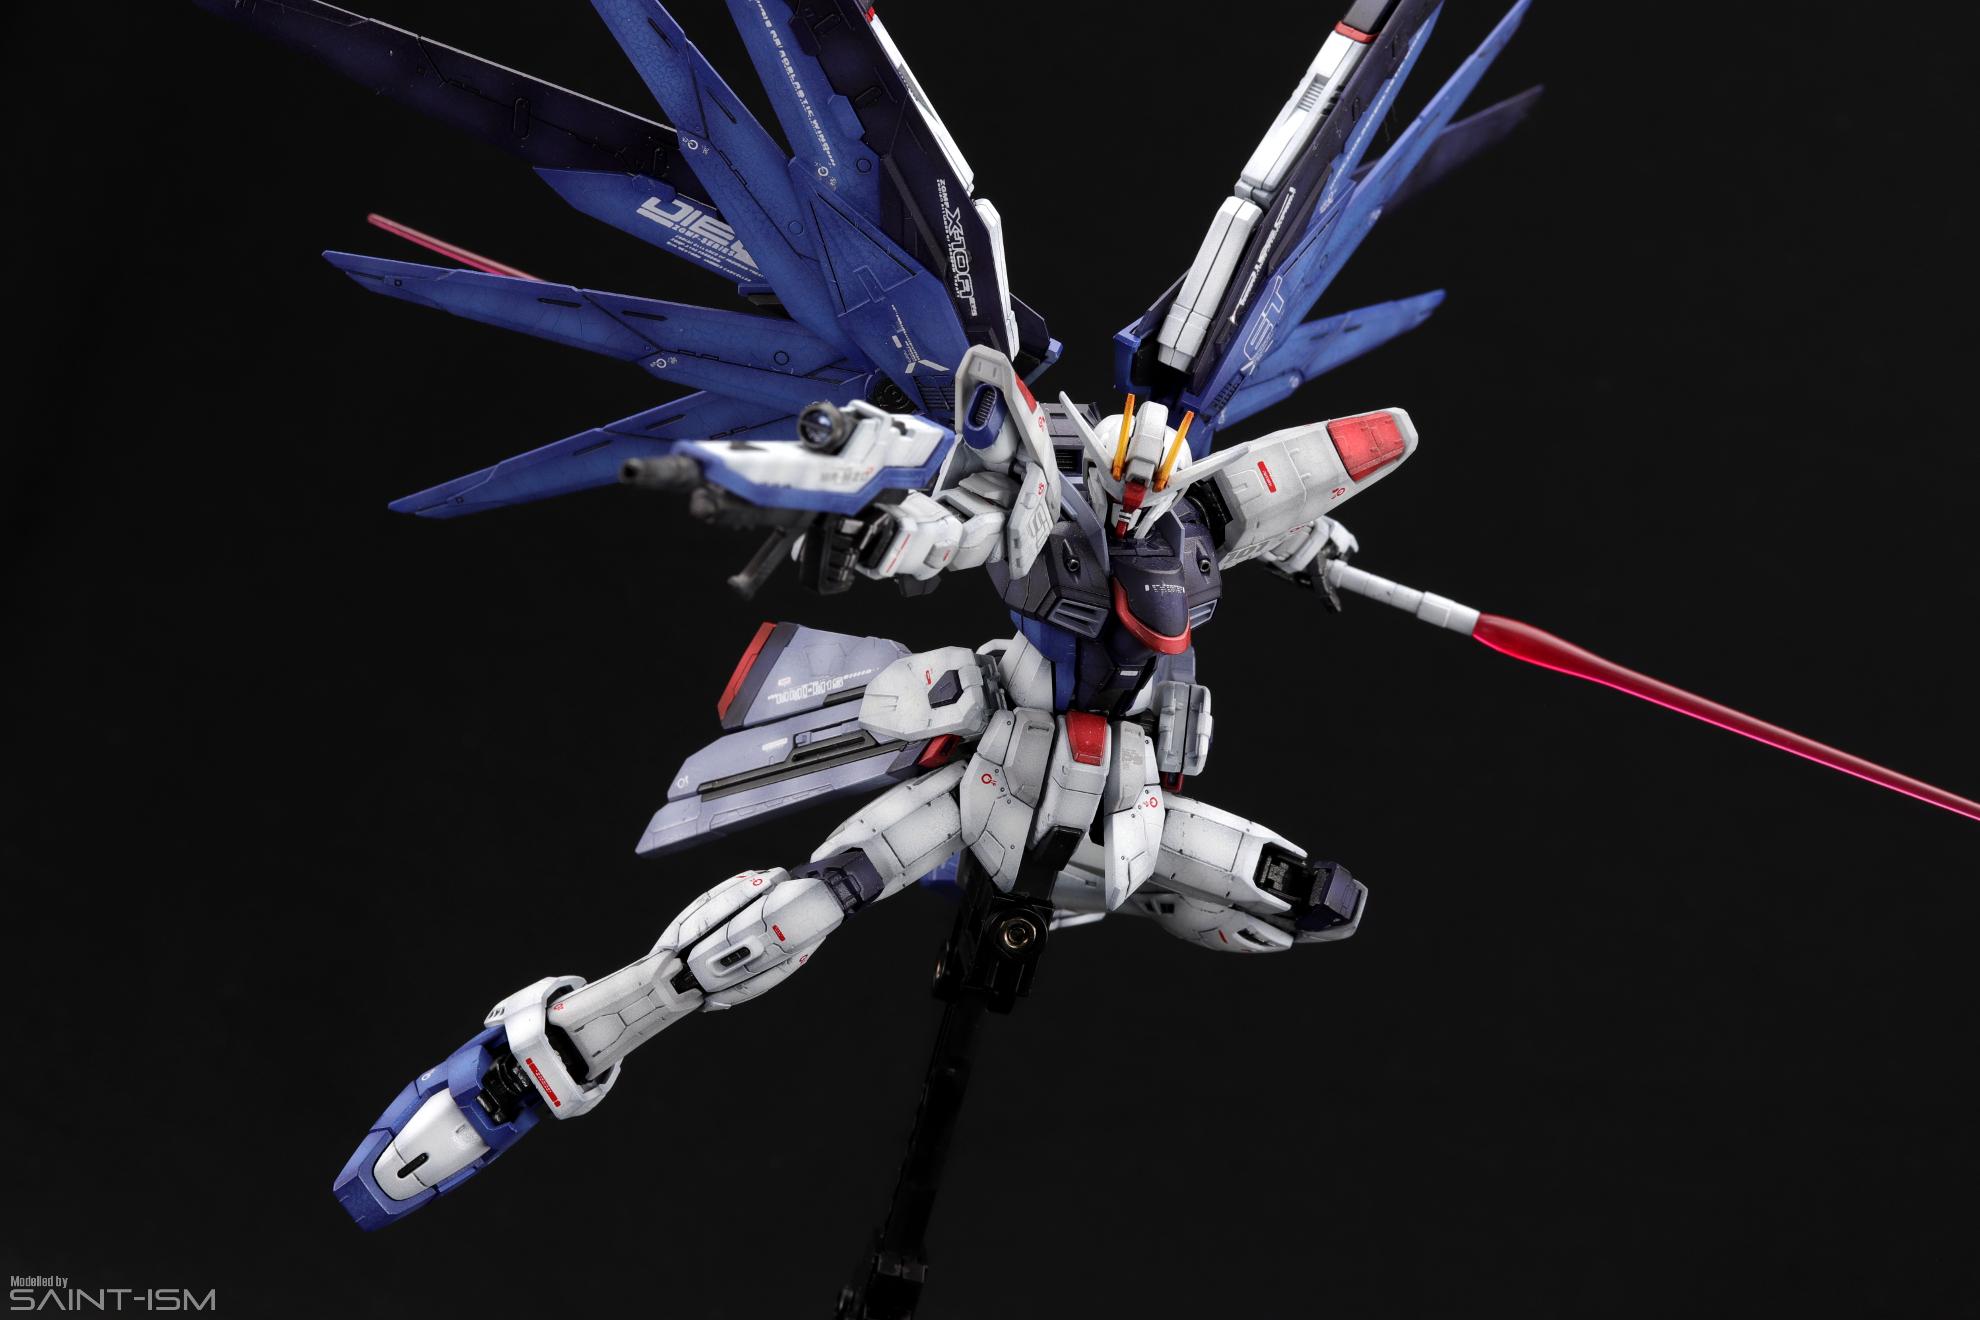 RG Freedom Gundam | Saint-ism – Gaming. Gunpla. Digital Art